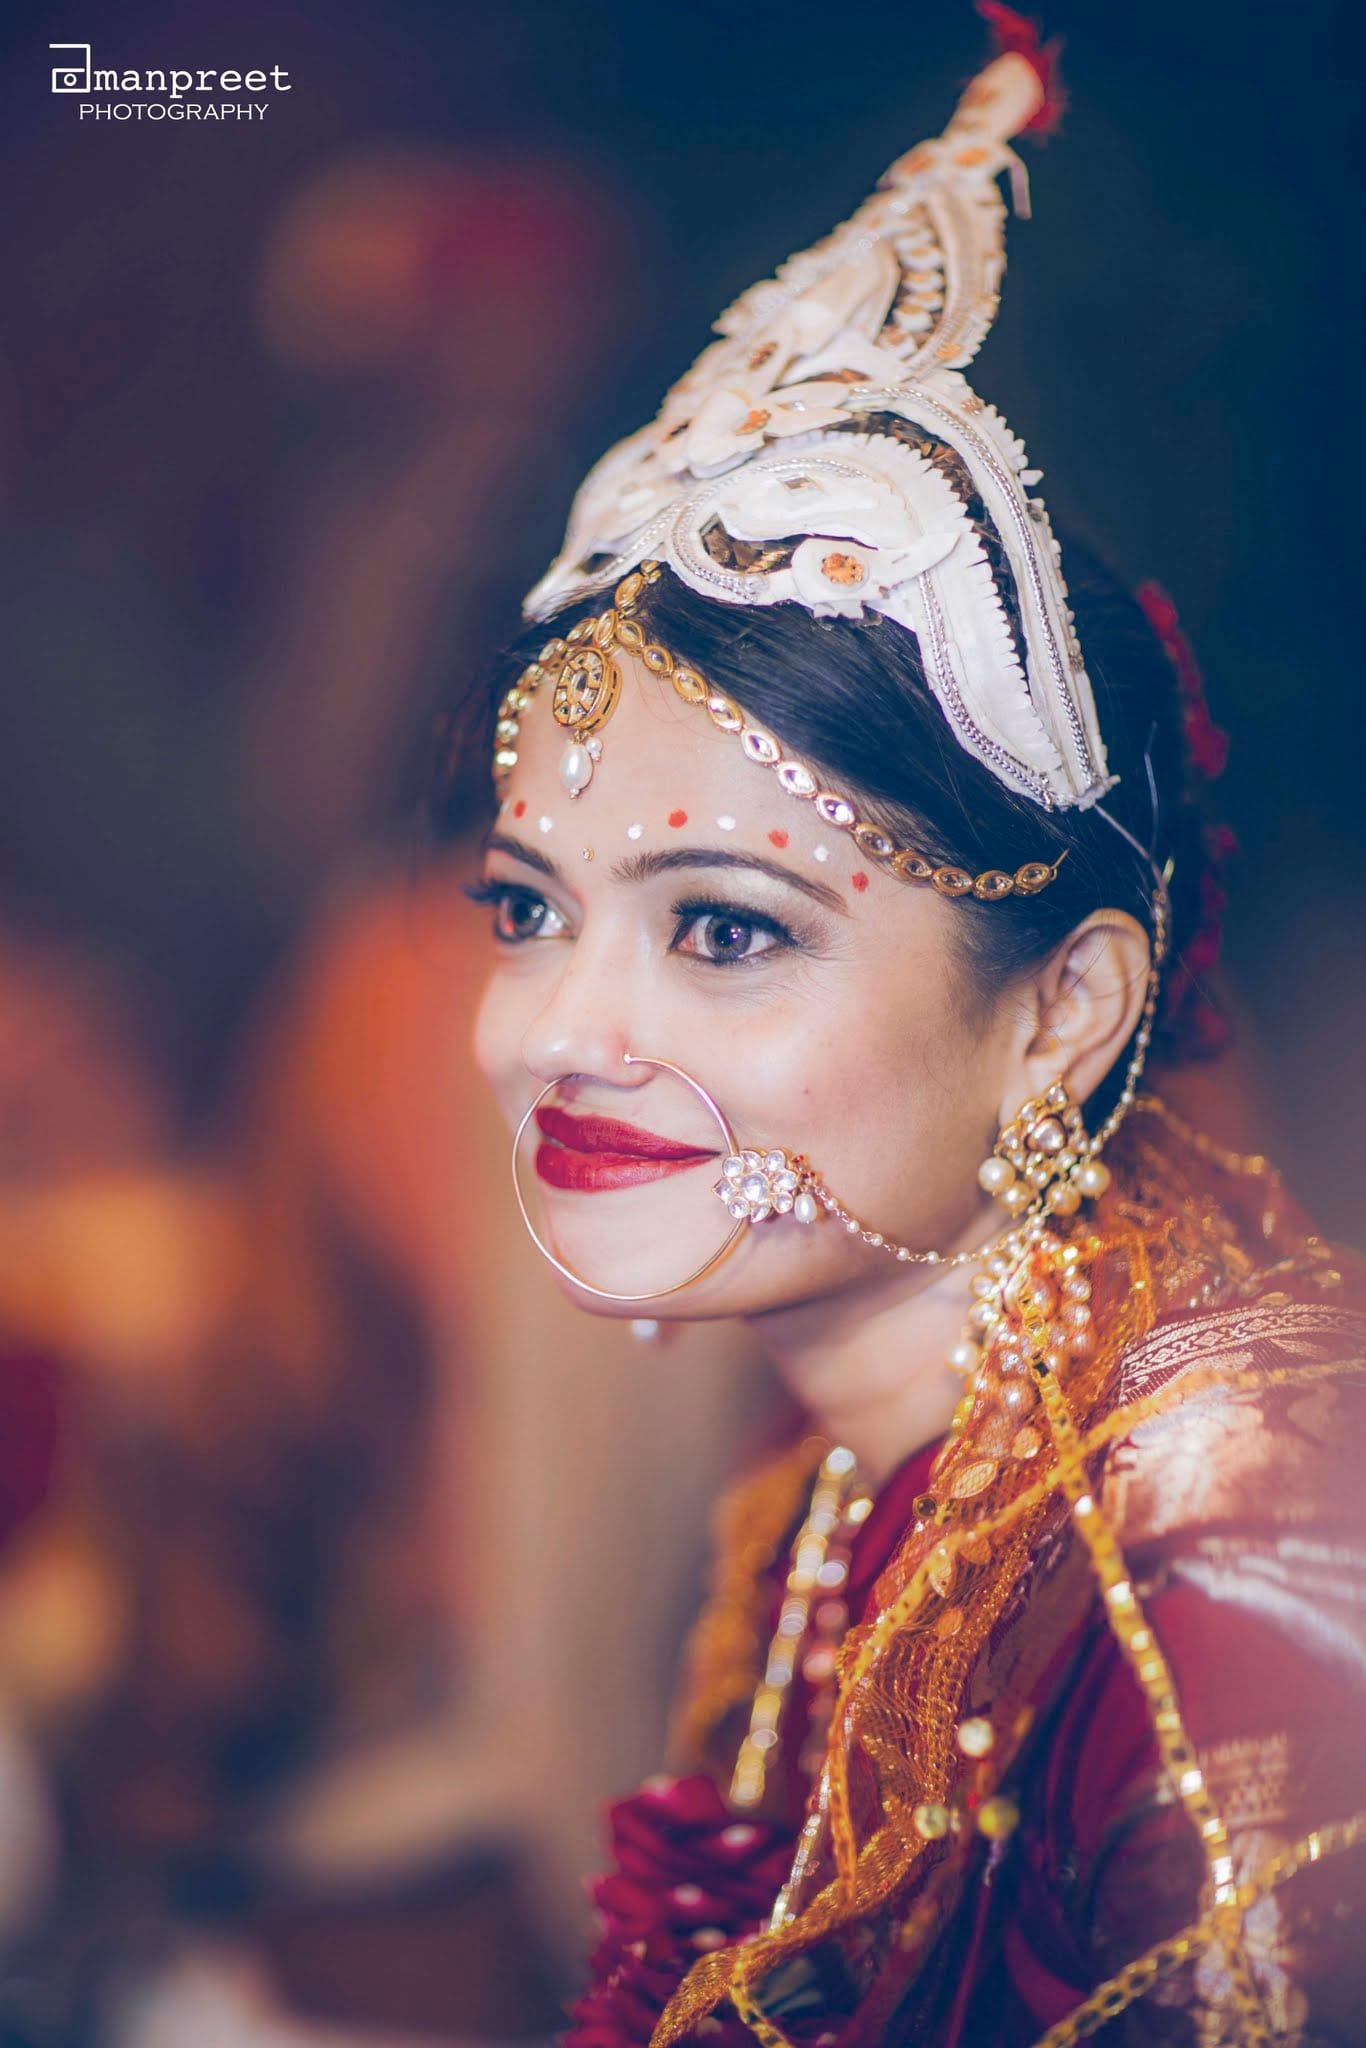 the bengali bride!:the umrao, mandira wirk, amanpreet photography, zorba